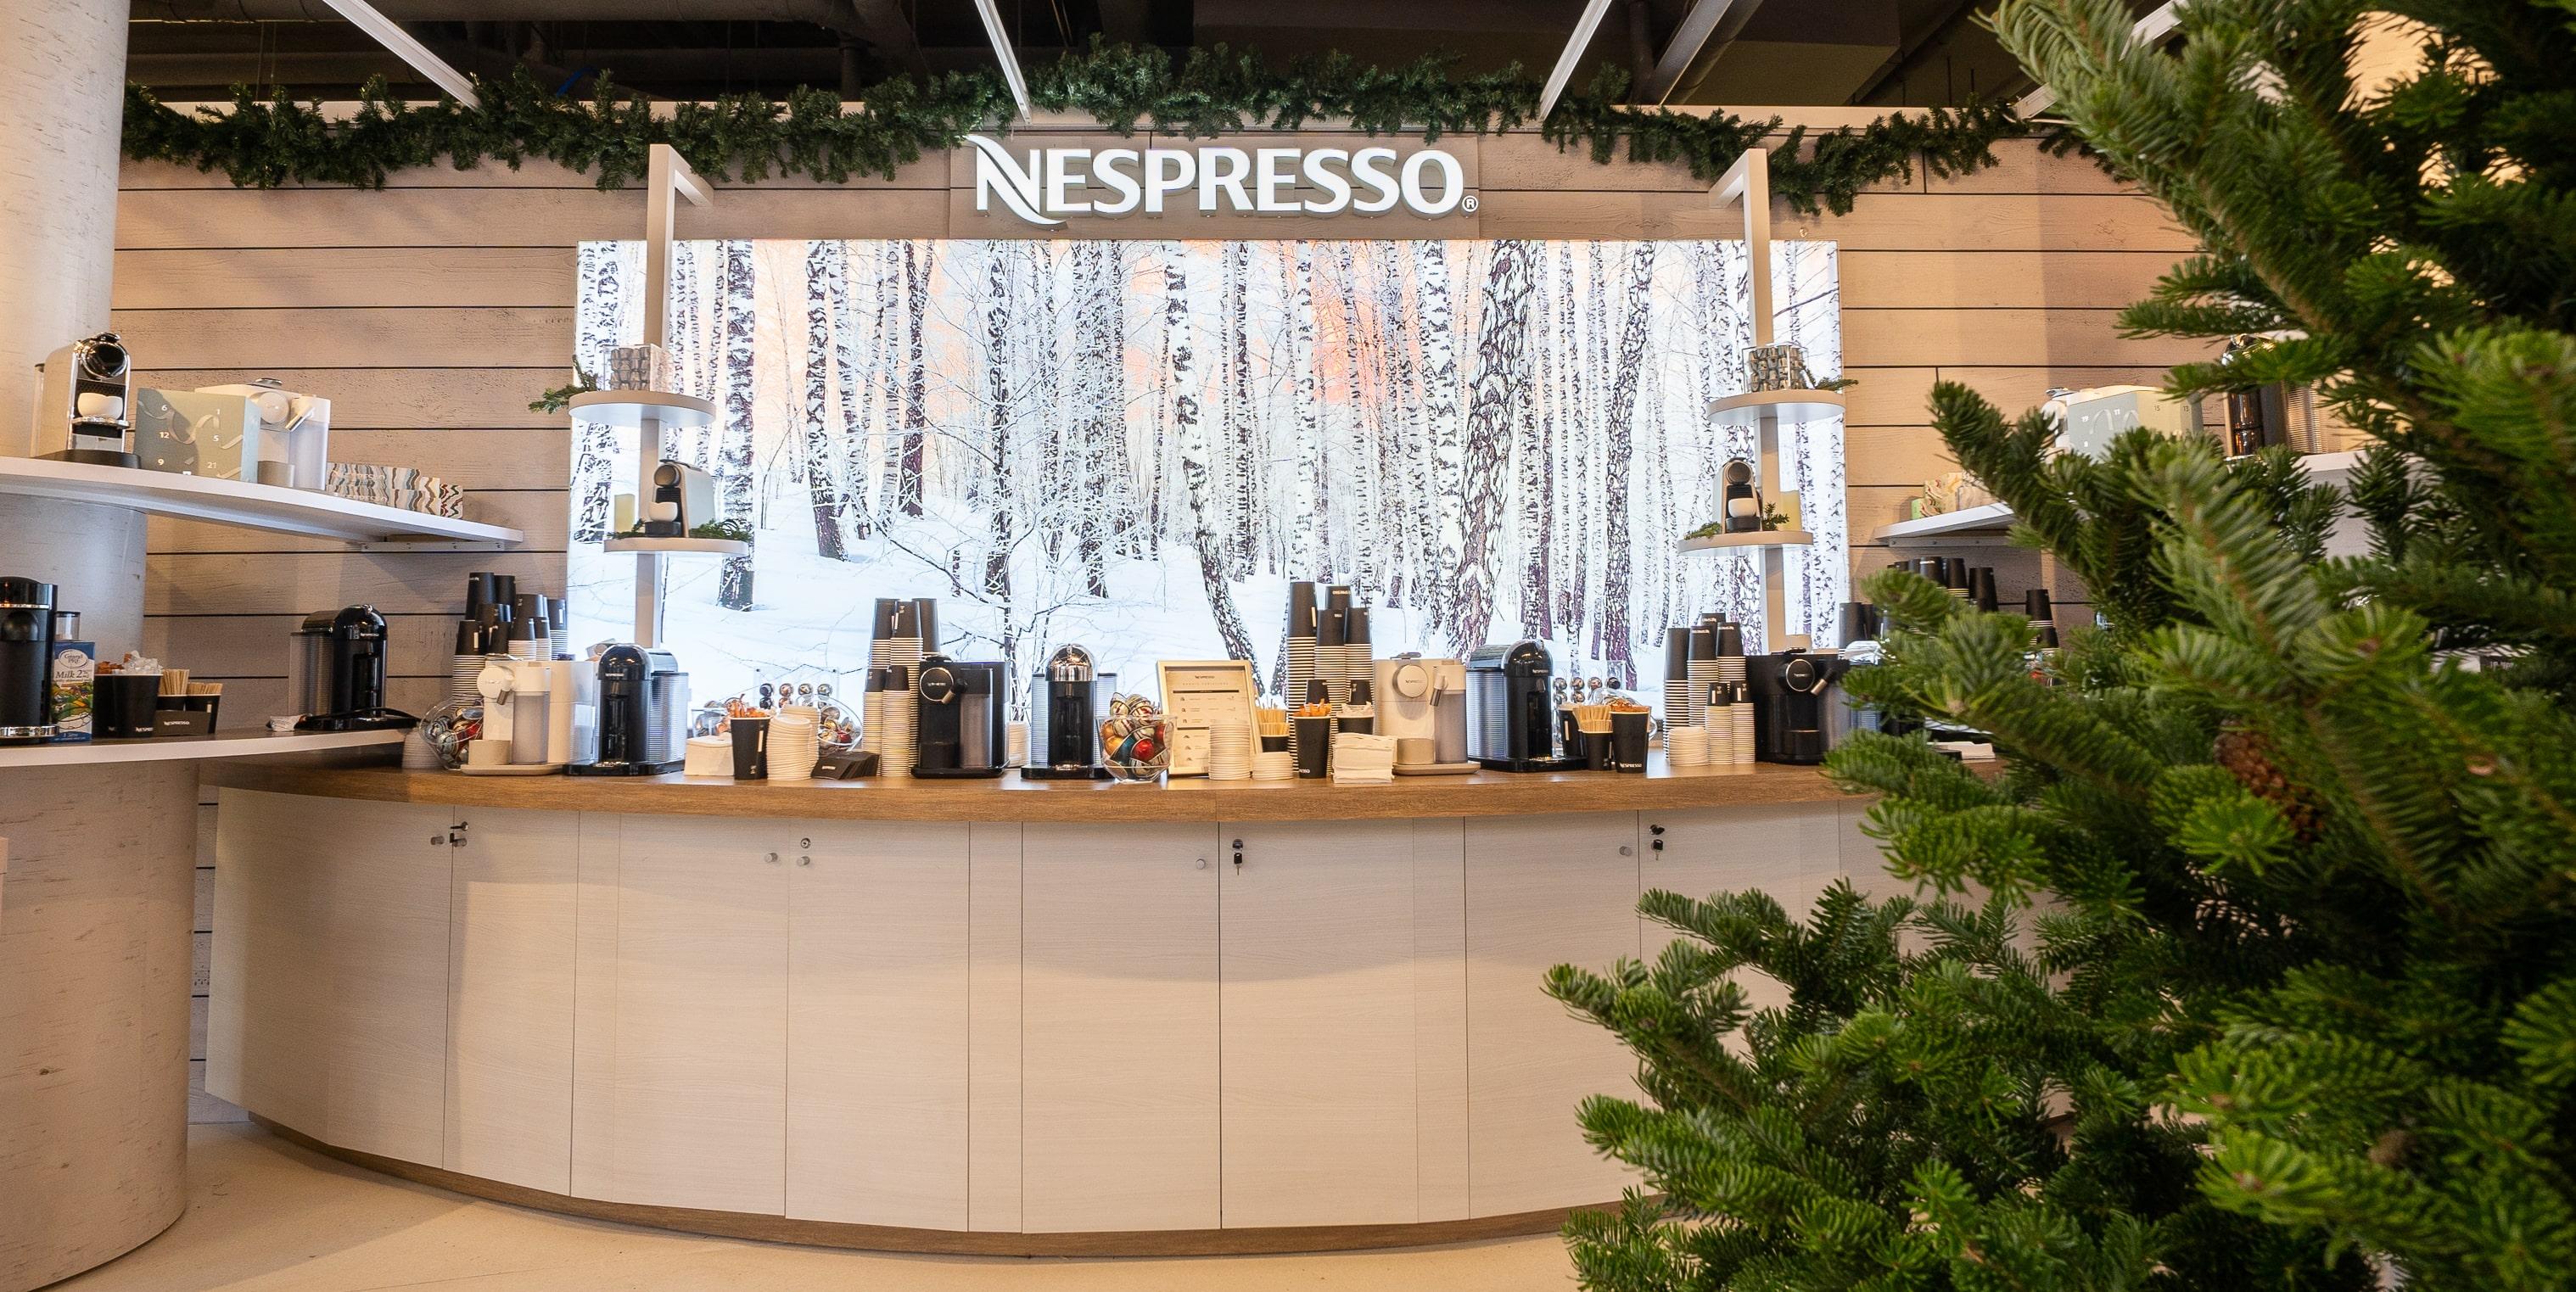 accordex_NespressoXmasMarket-Stills